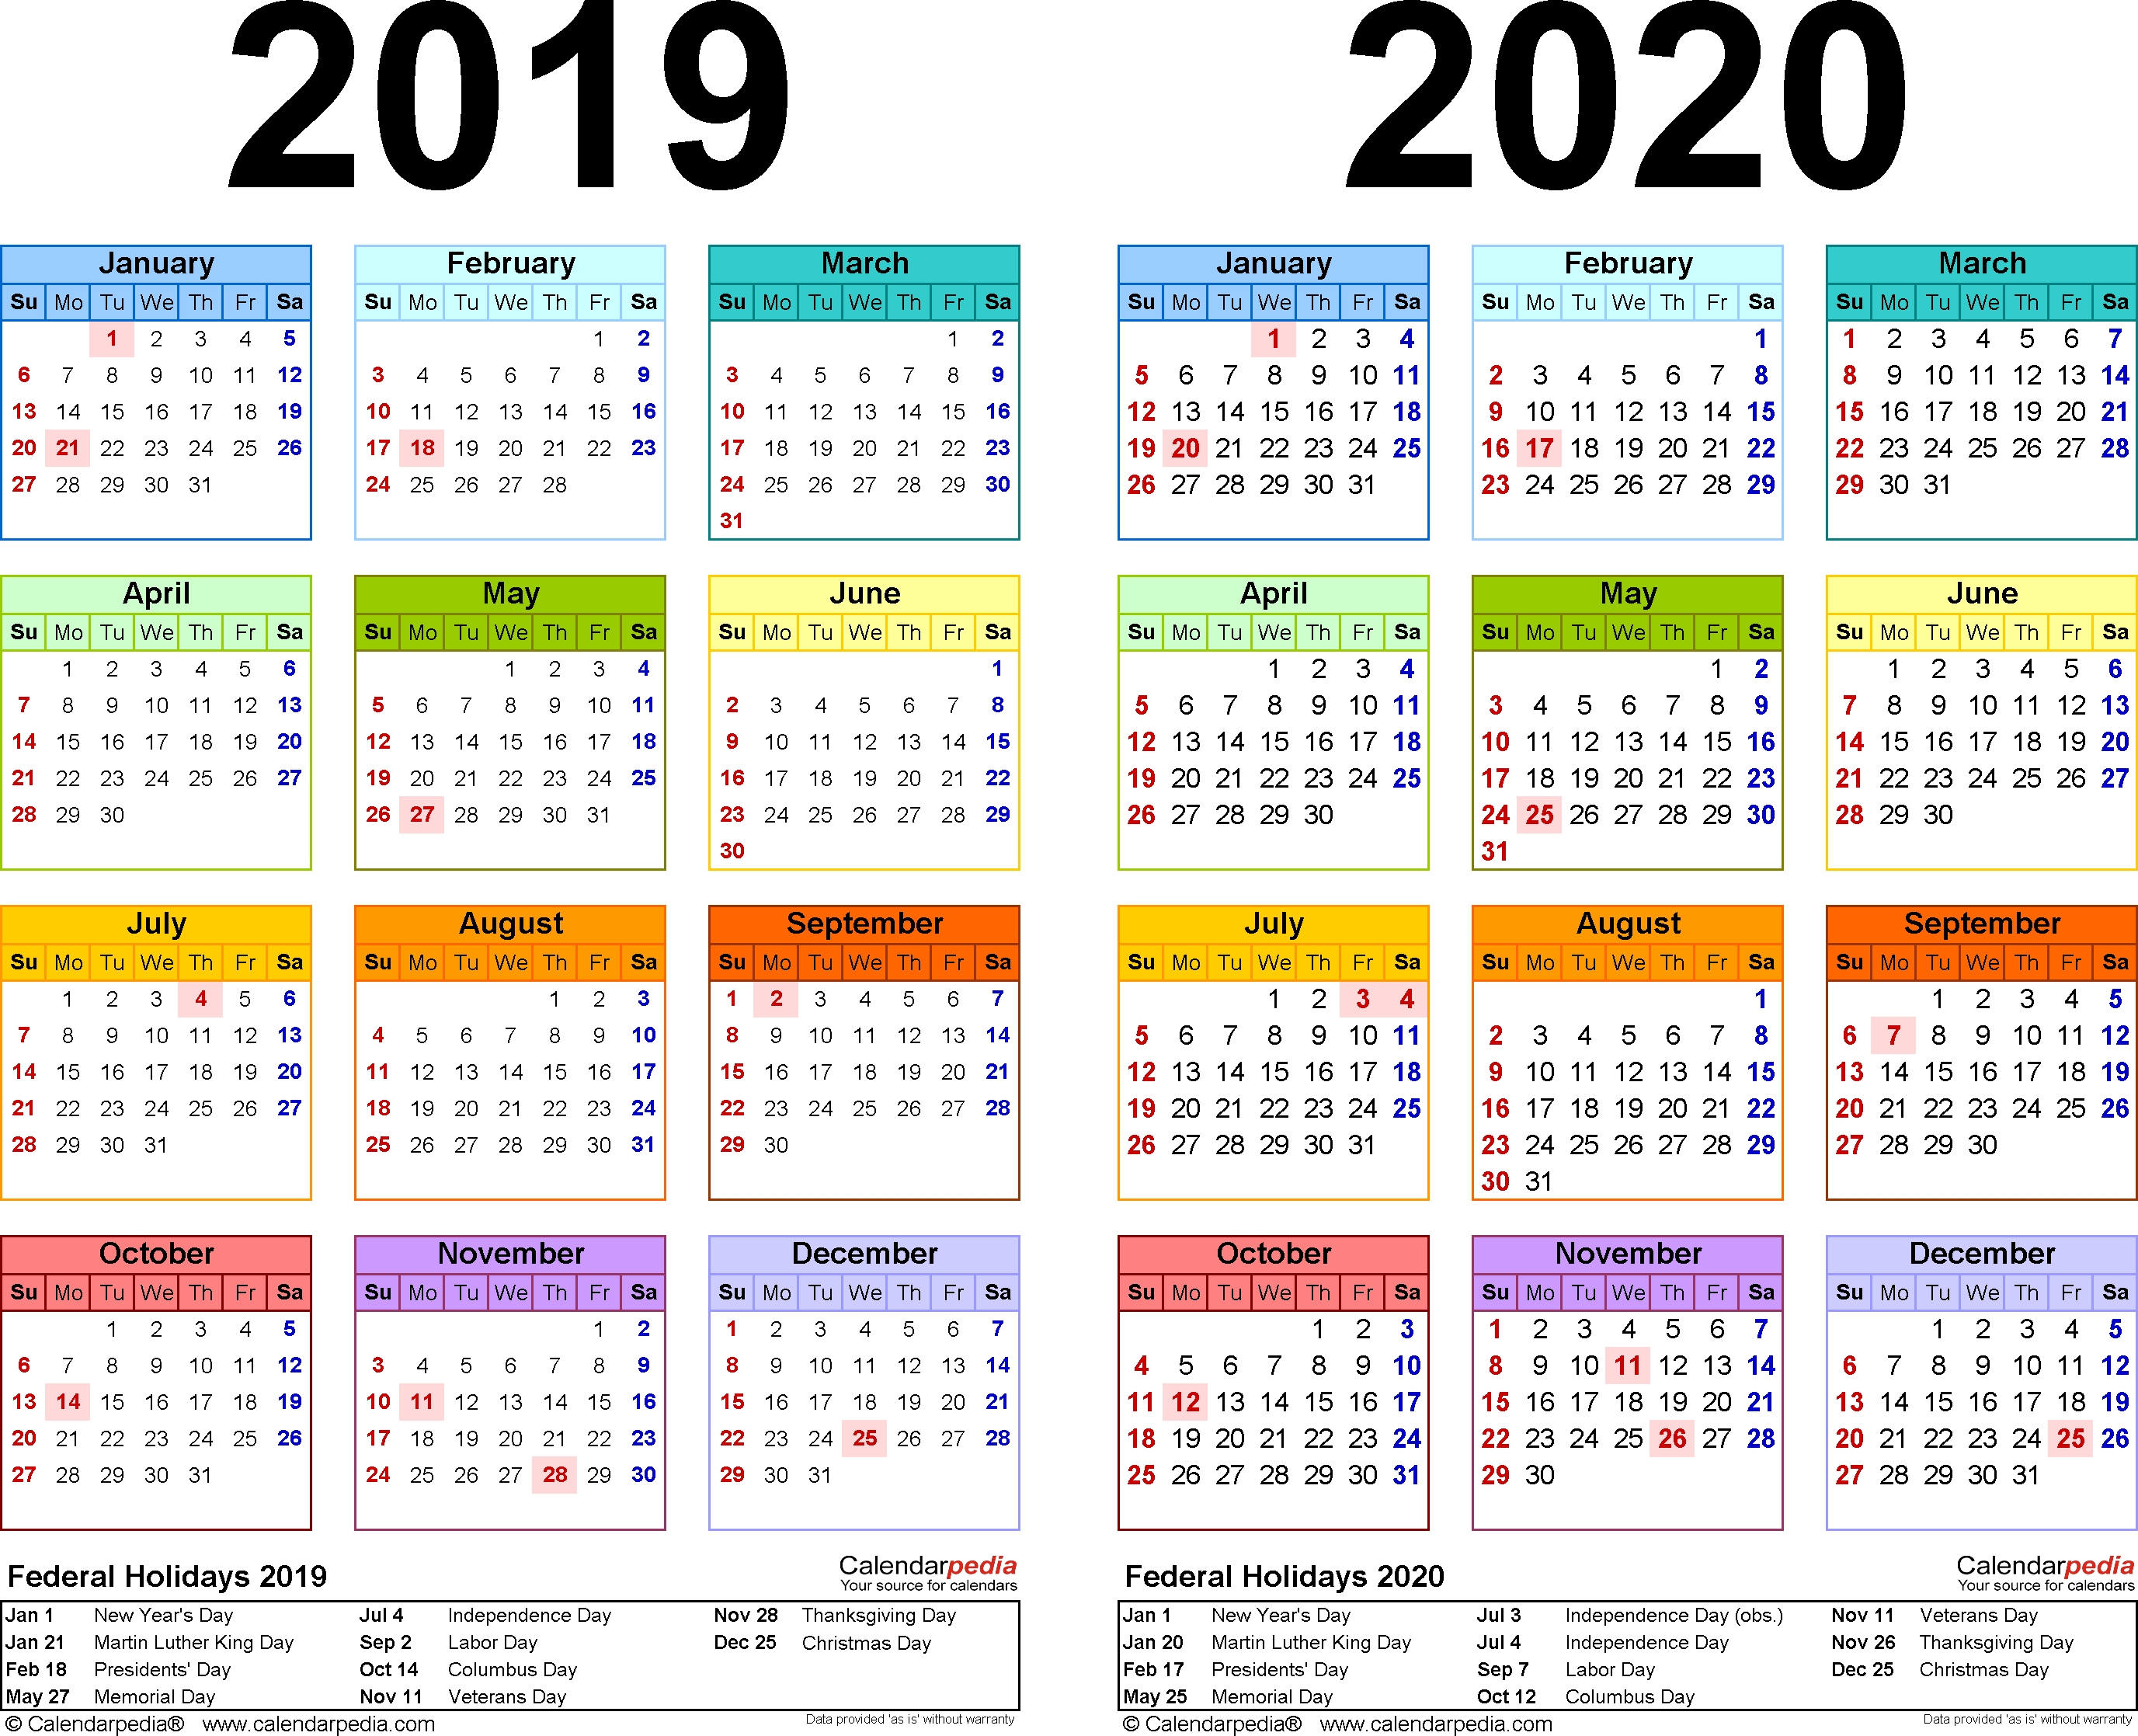 2019-2020 Calendar - Free Printable Two-Year Pdf Calendars intended for Free Printable Calendars 2019-2020 With Holidays